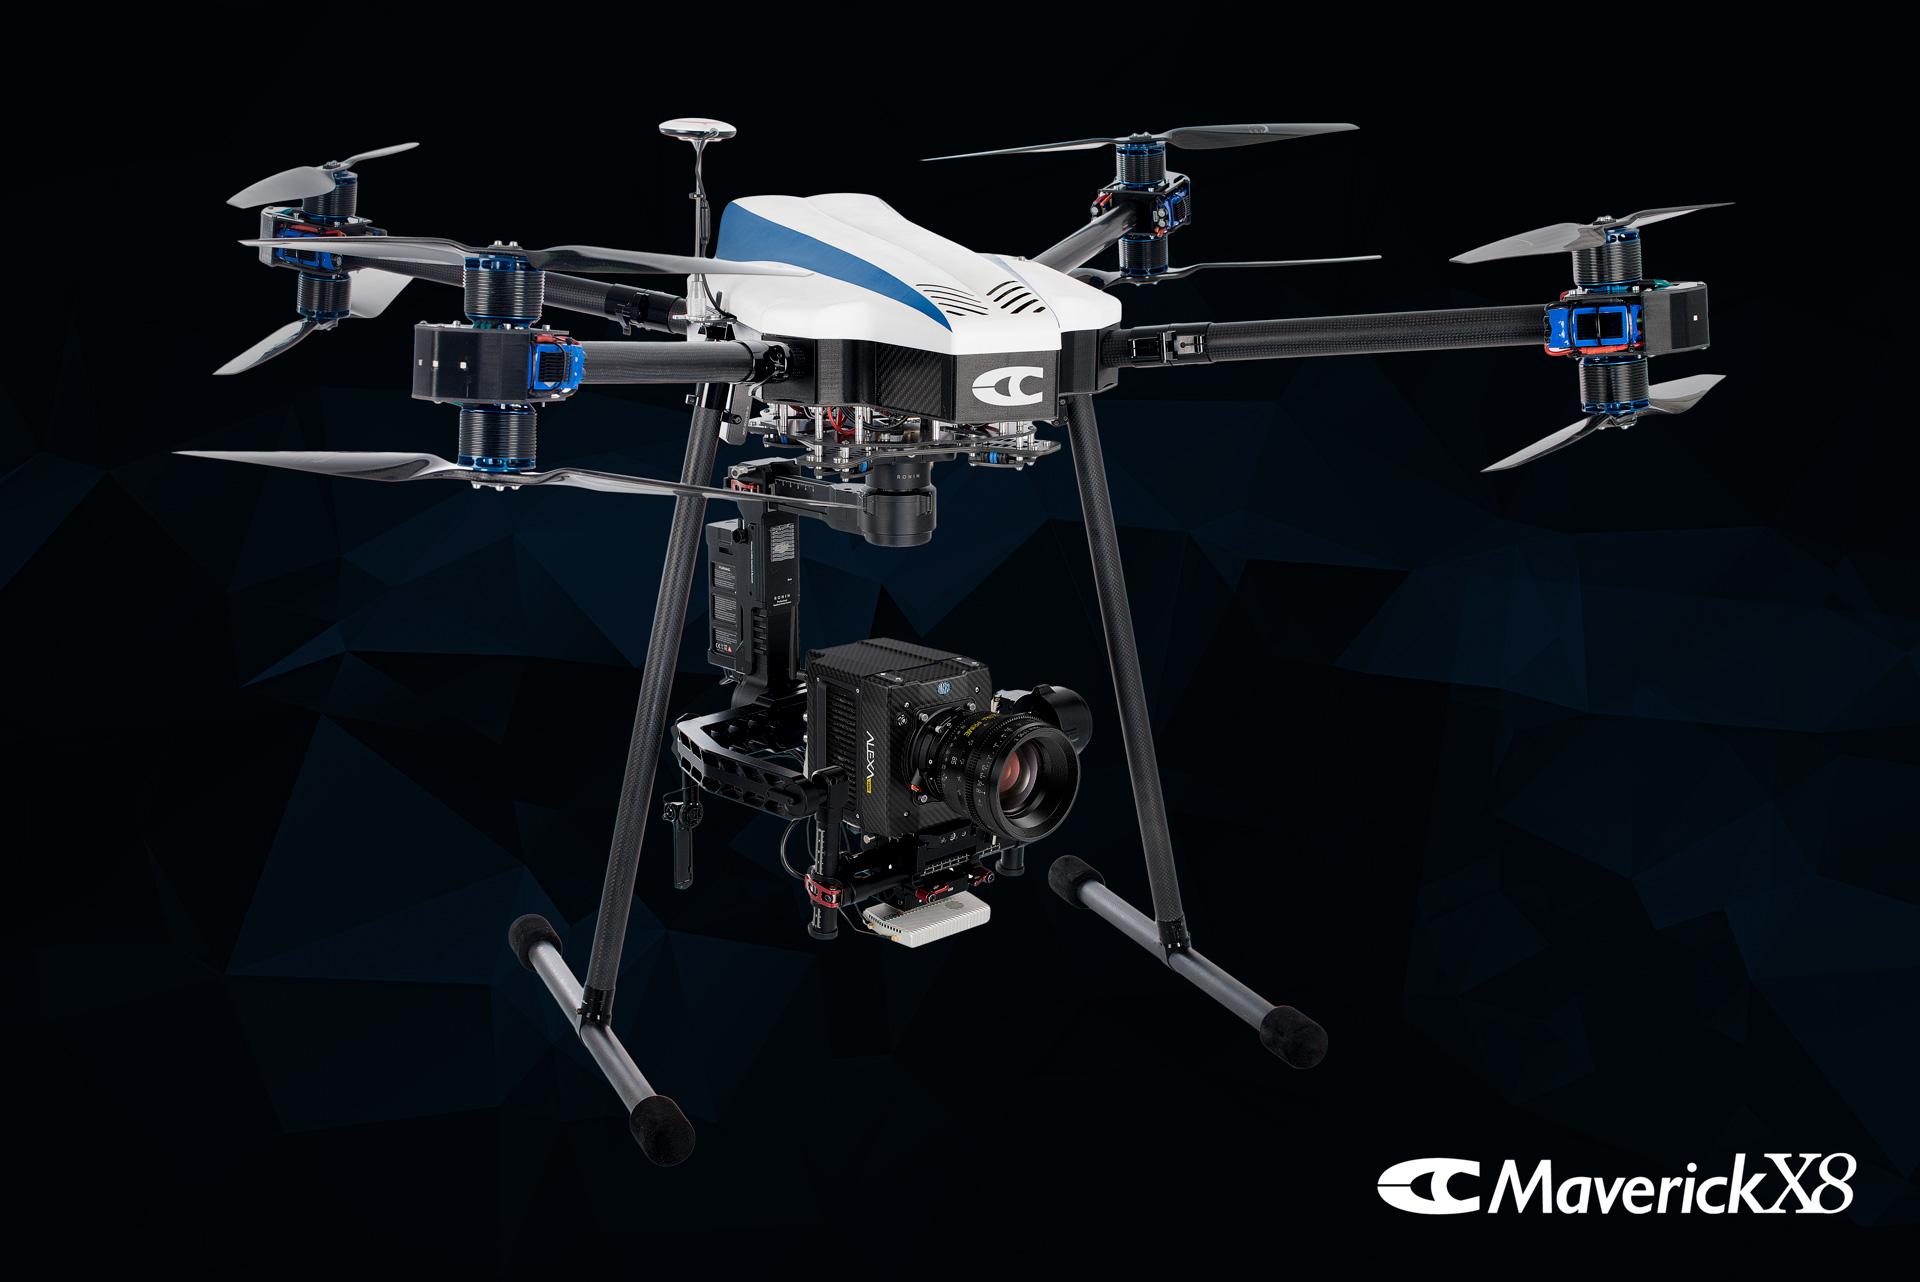 Noleggio-droni-NOKIA-OZO-Cinema service drone-riprese drone cinema-noleggio drone alexa mini-noleggio droni Red Dragon